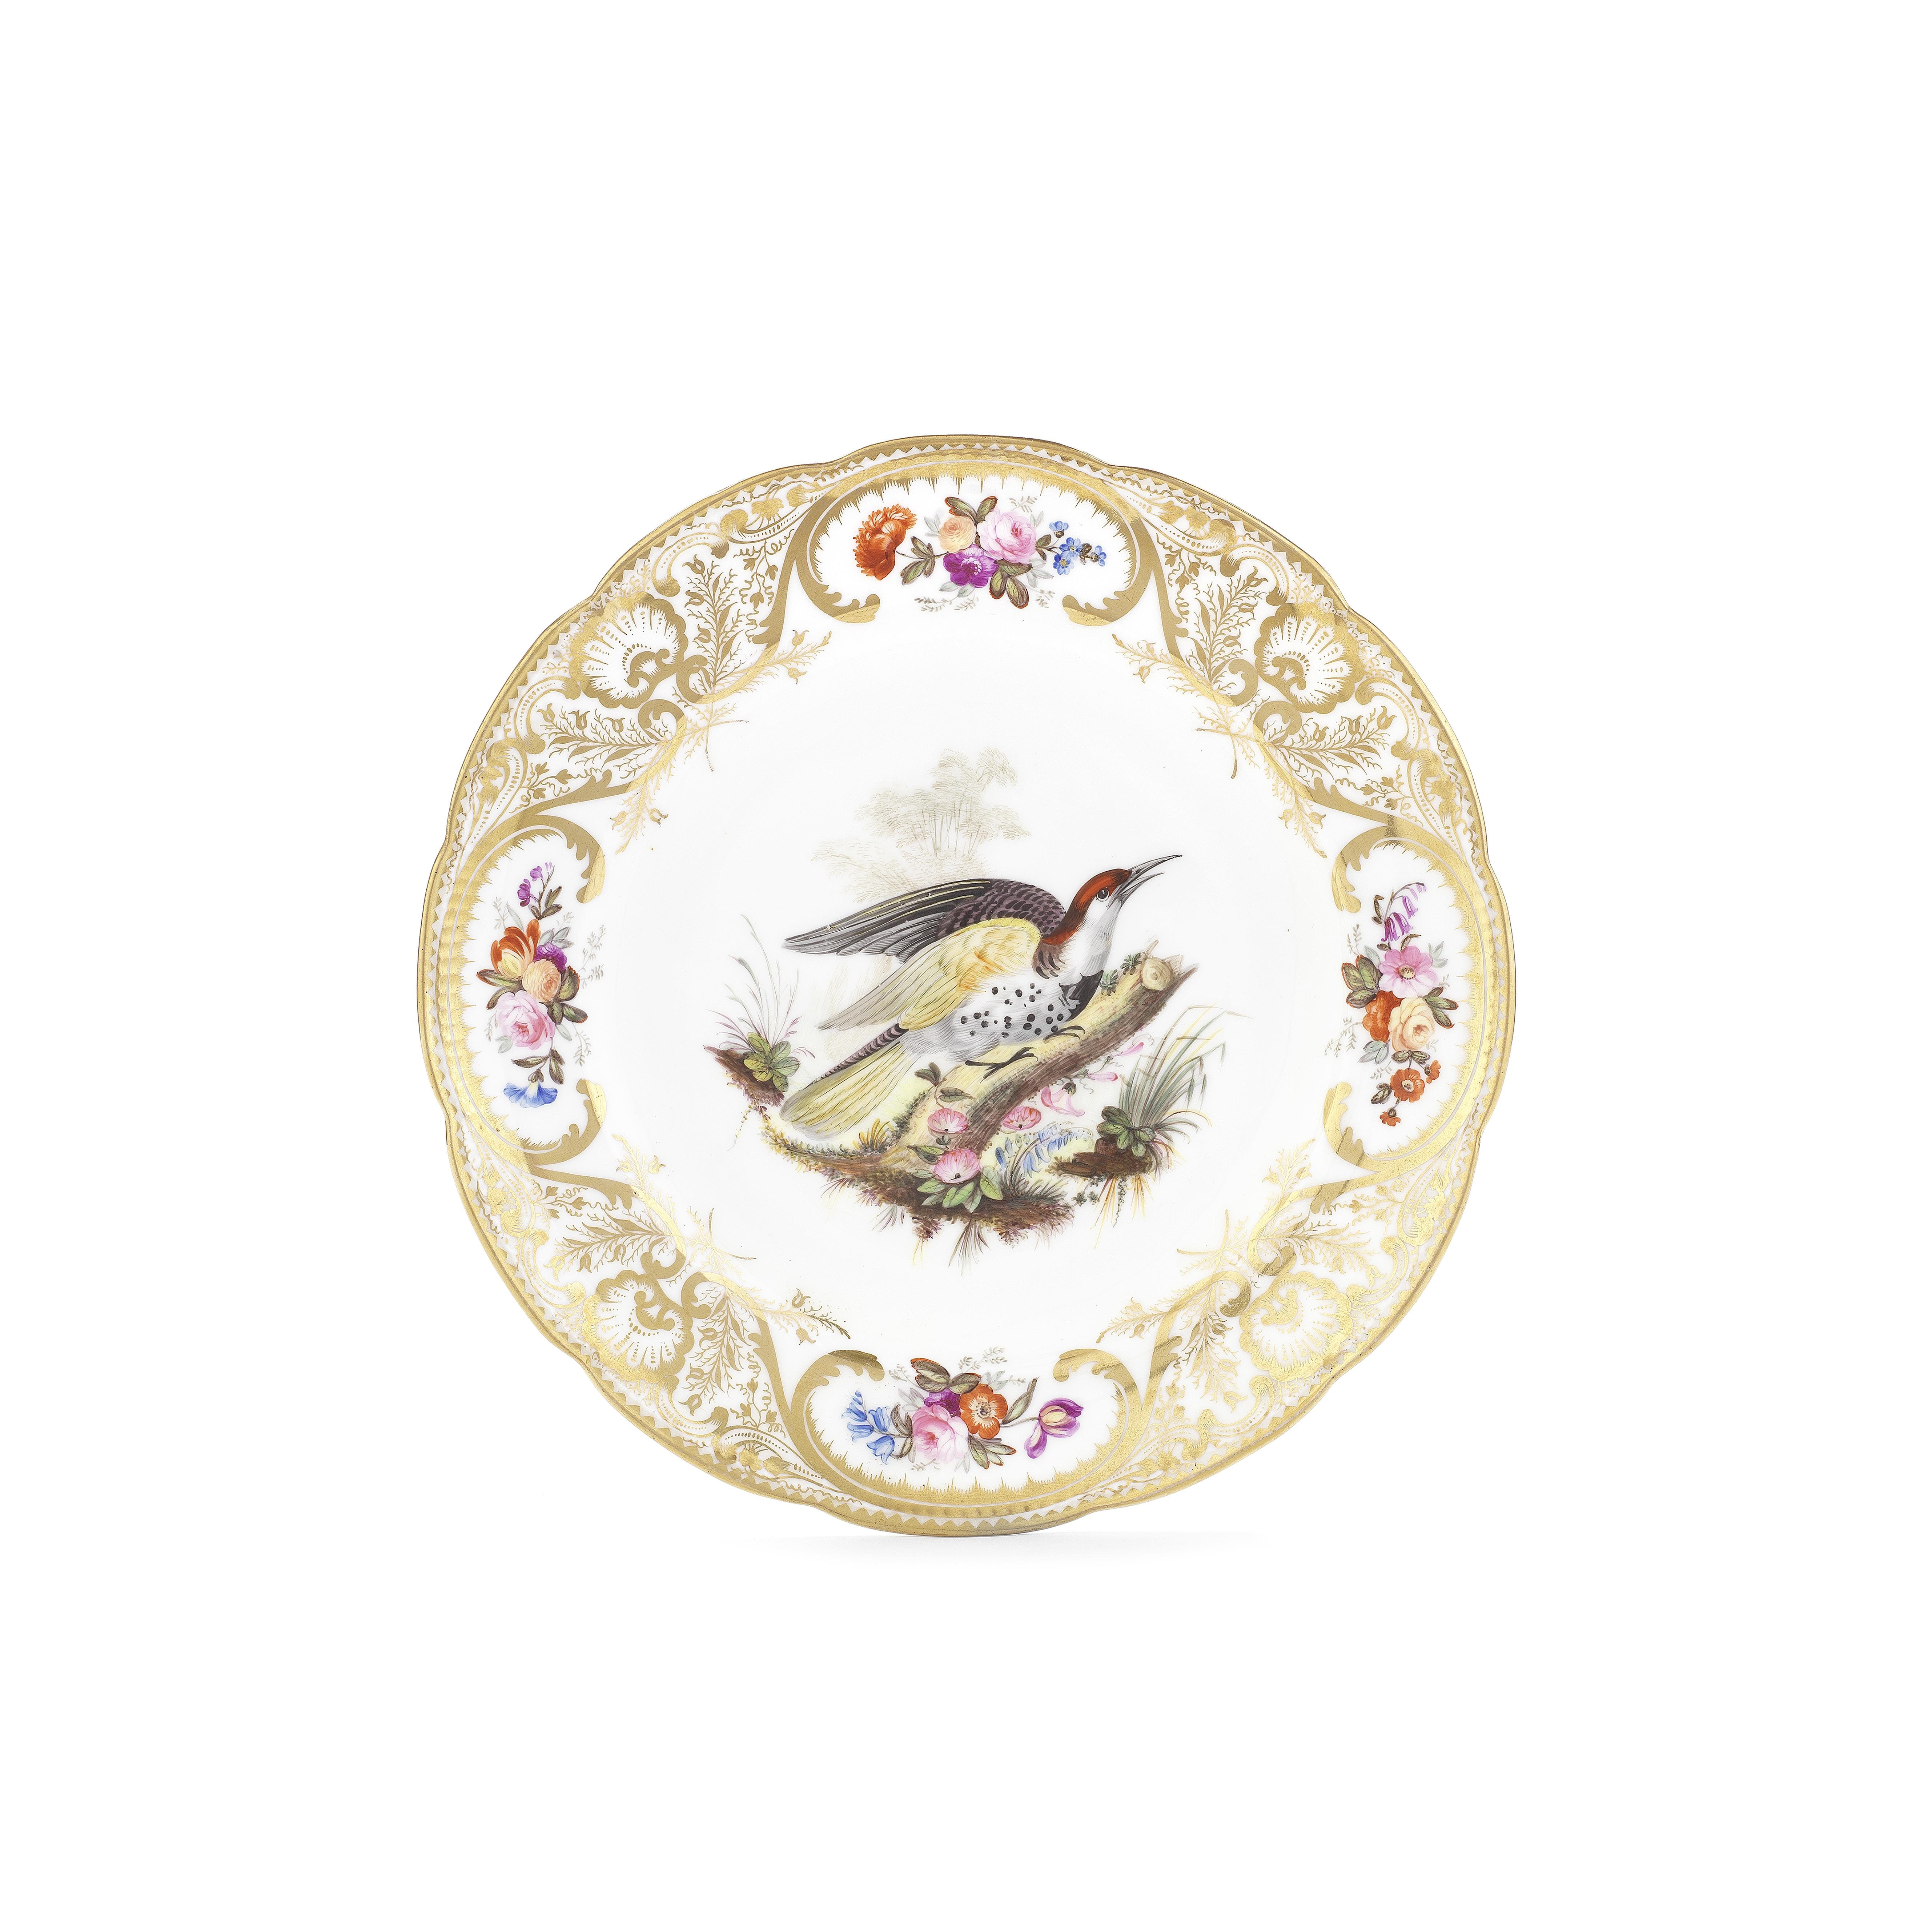 A good Nantgarw plate of Mackintosh type, circa 1818-20